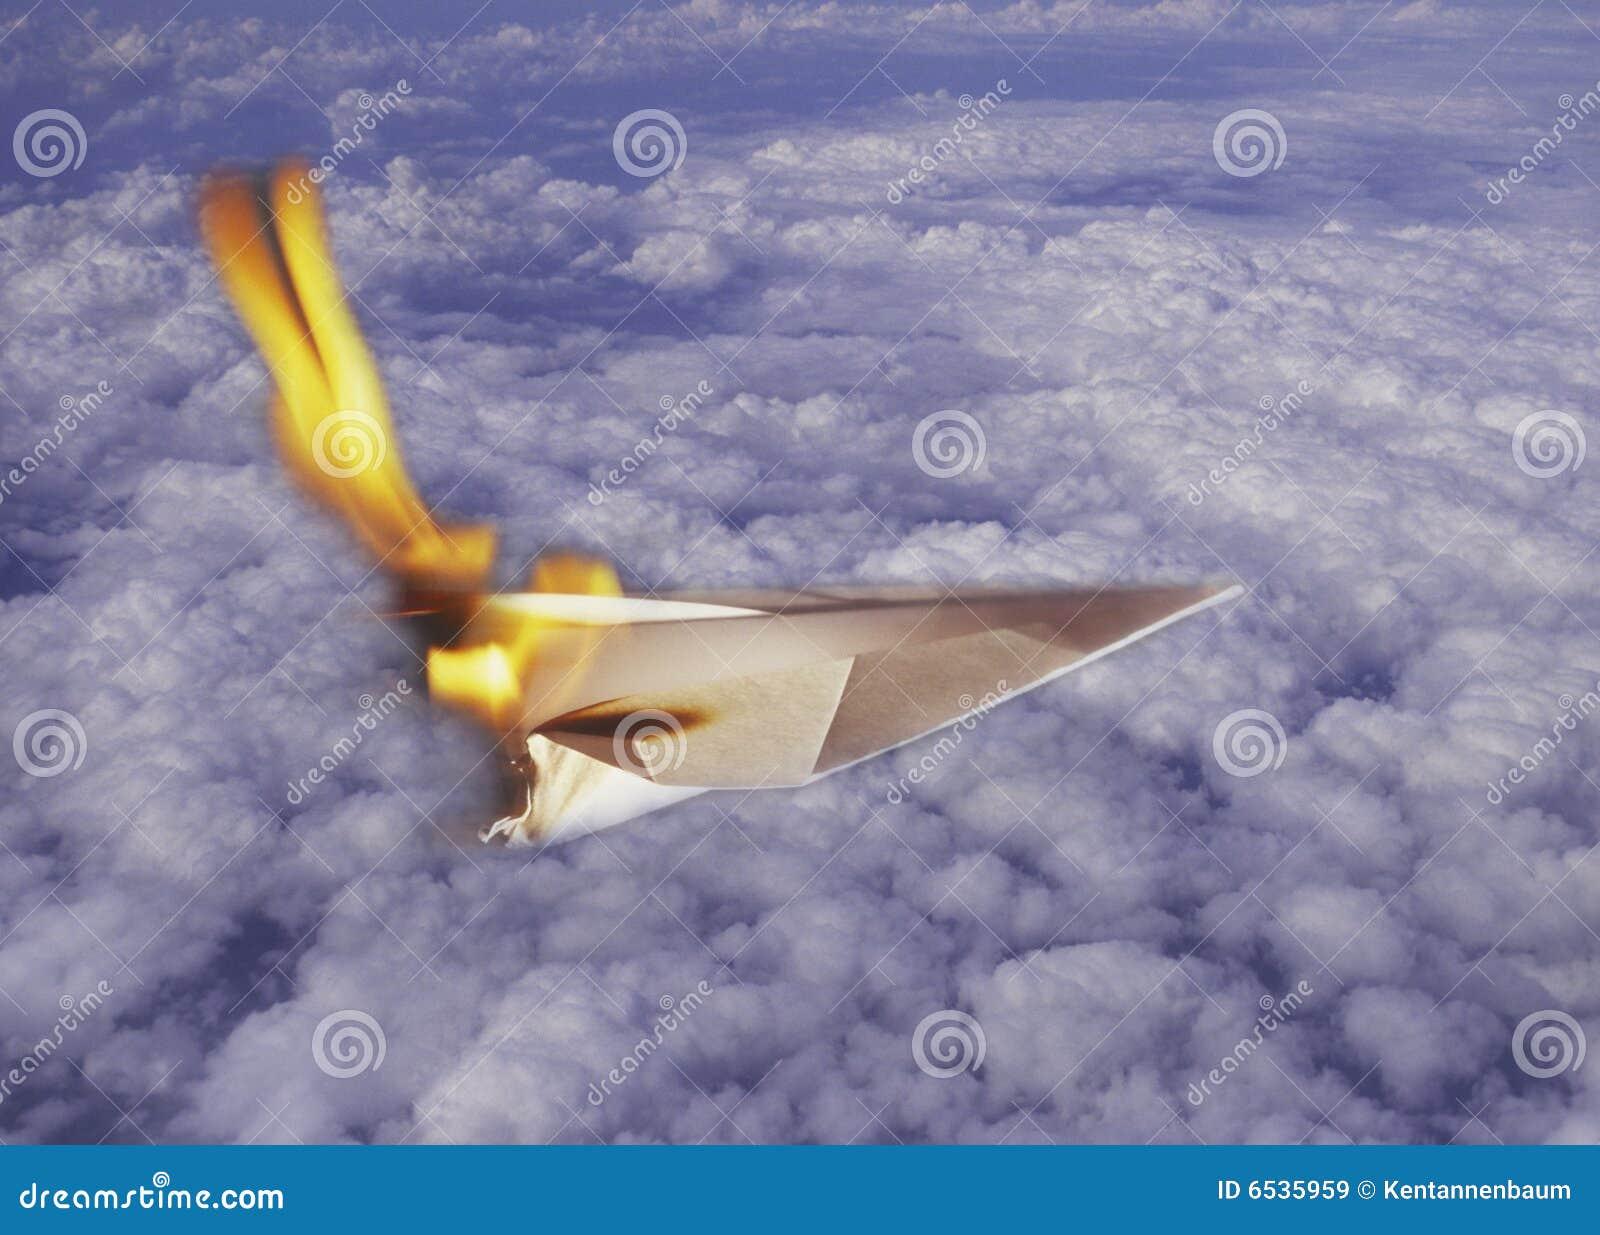 paper plane stock illustration - photo #28